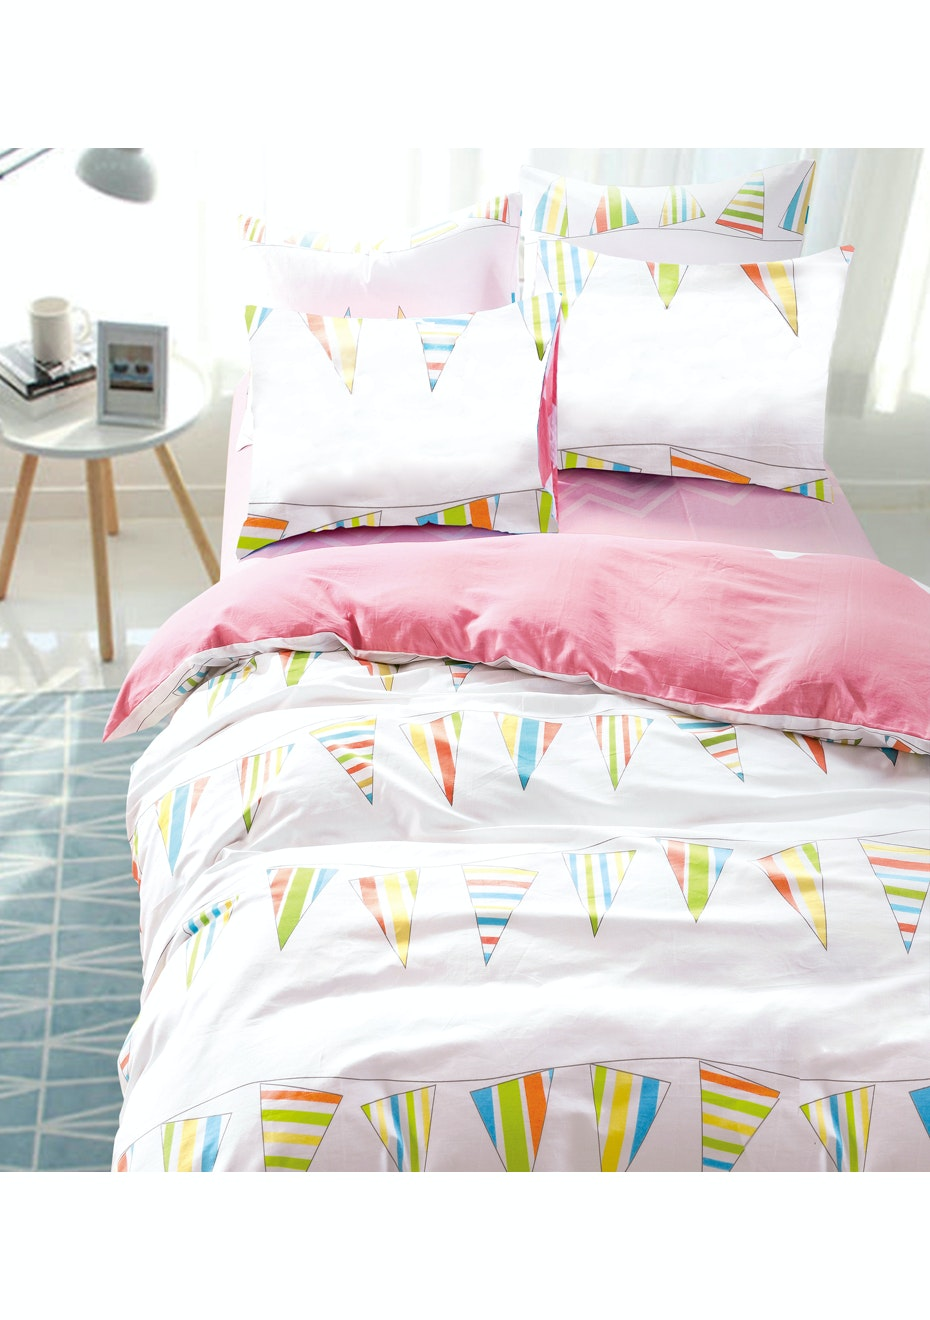 Carnival Quilt Cover Set - Reversible Design - 100% Cotton Double Bed